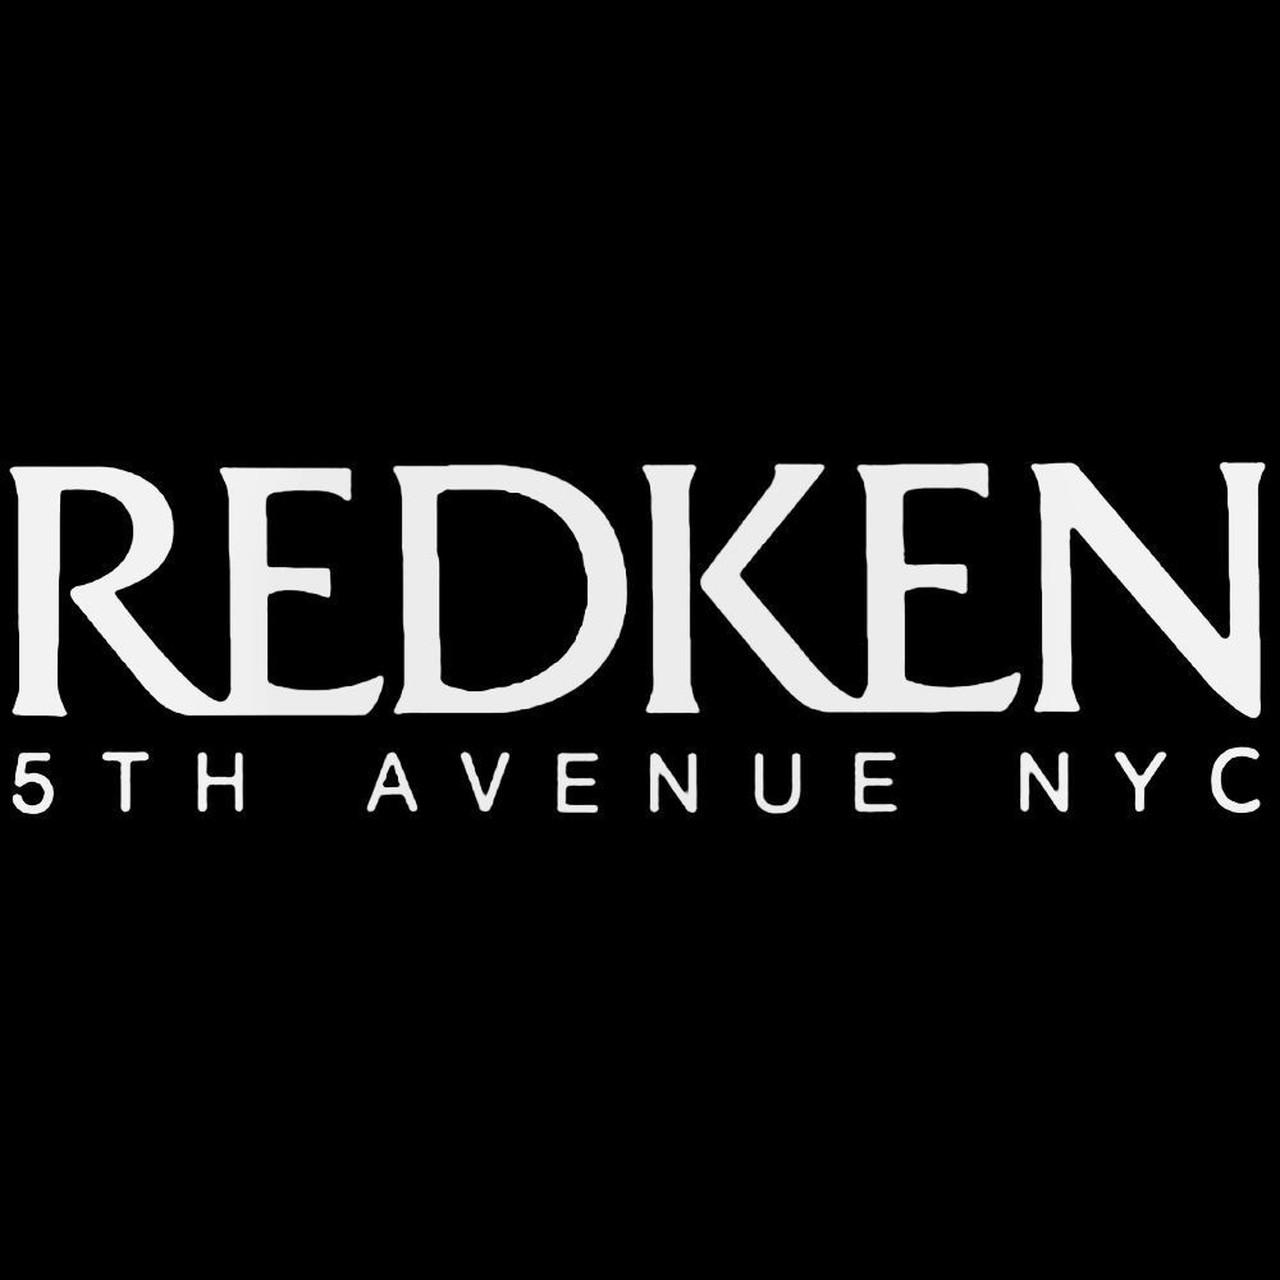 Redken Logo Decal Sticker.